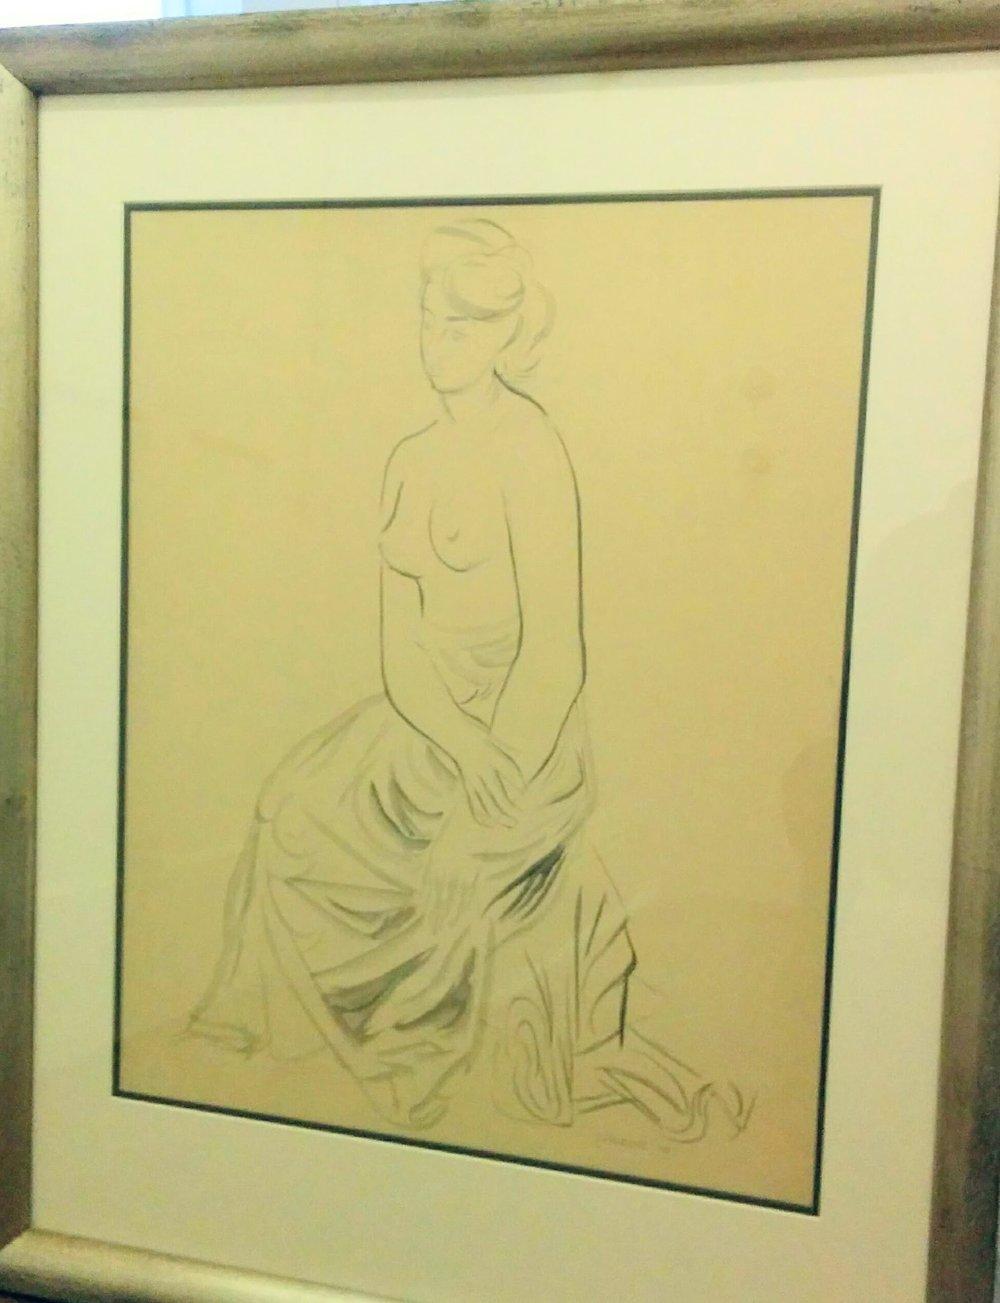 Stanley Cosgrove'Half Draped Nude' - Ink on Paper21